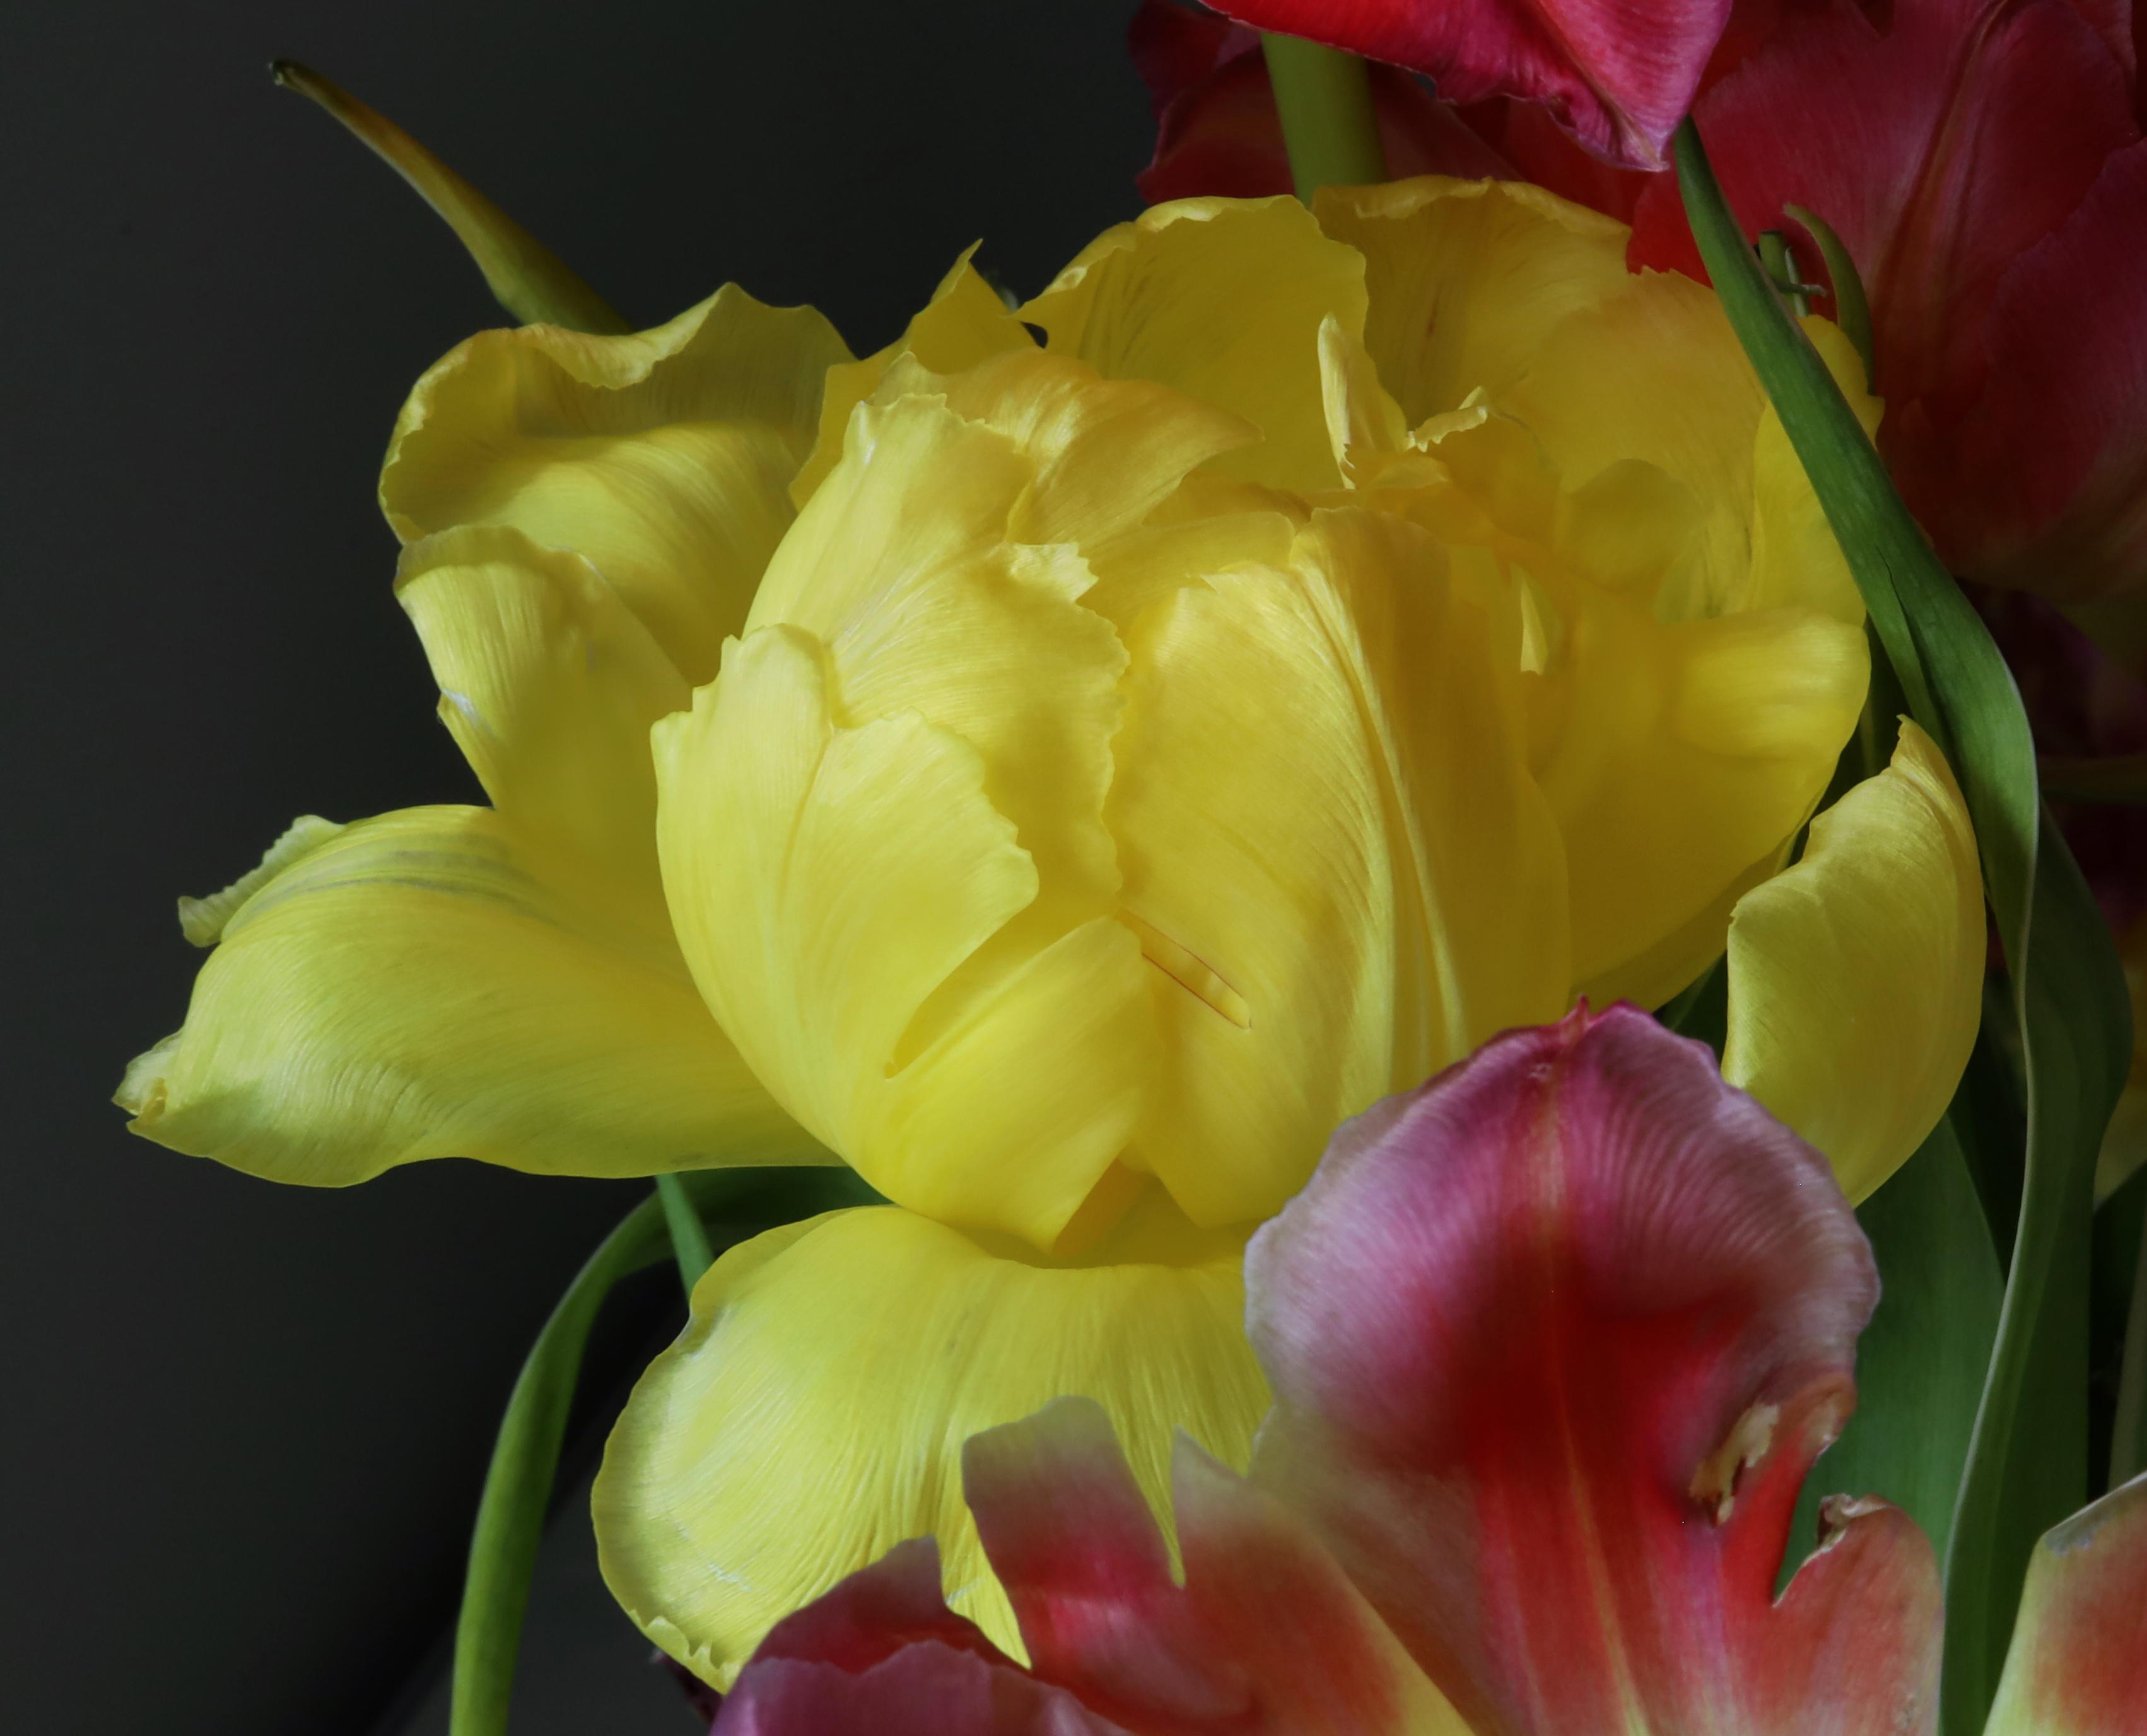 yellow tulip crop